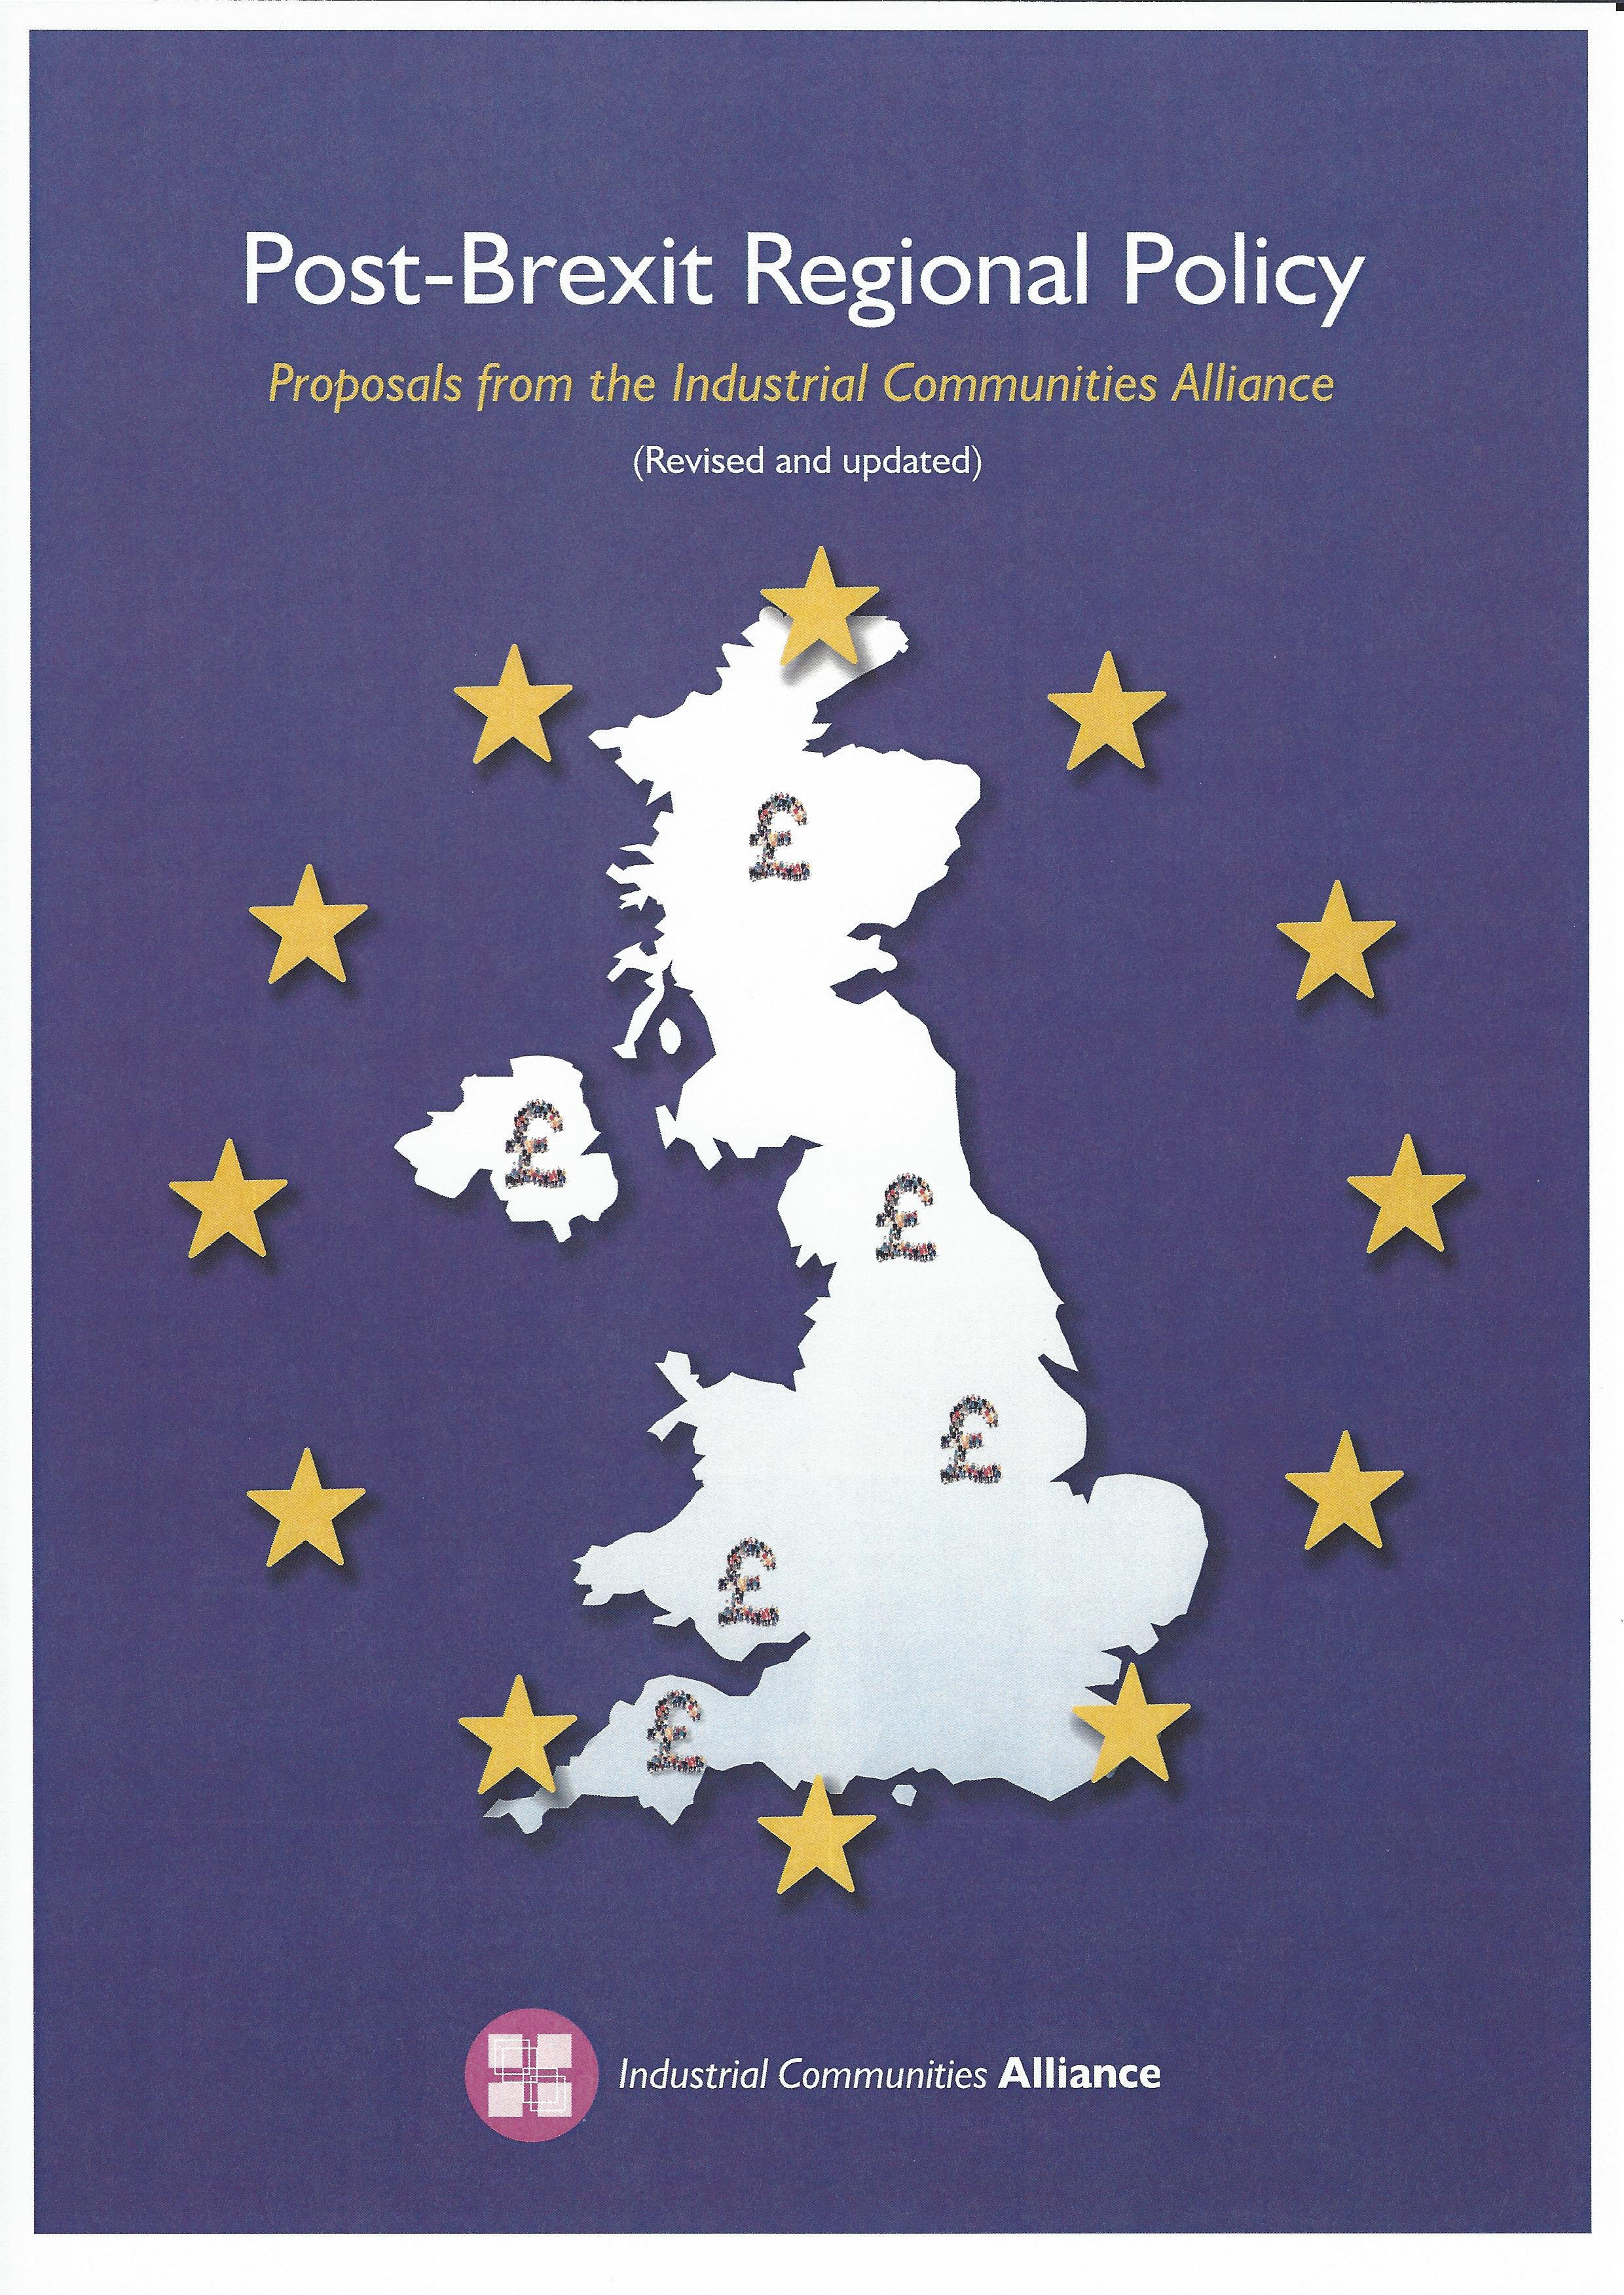 Post-Brexit Regional Policy (Scotland)